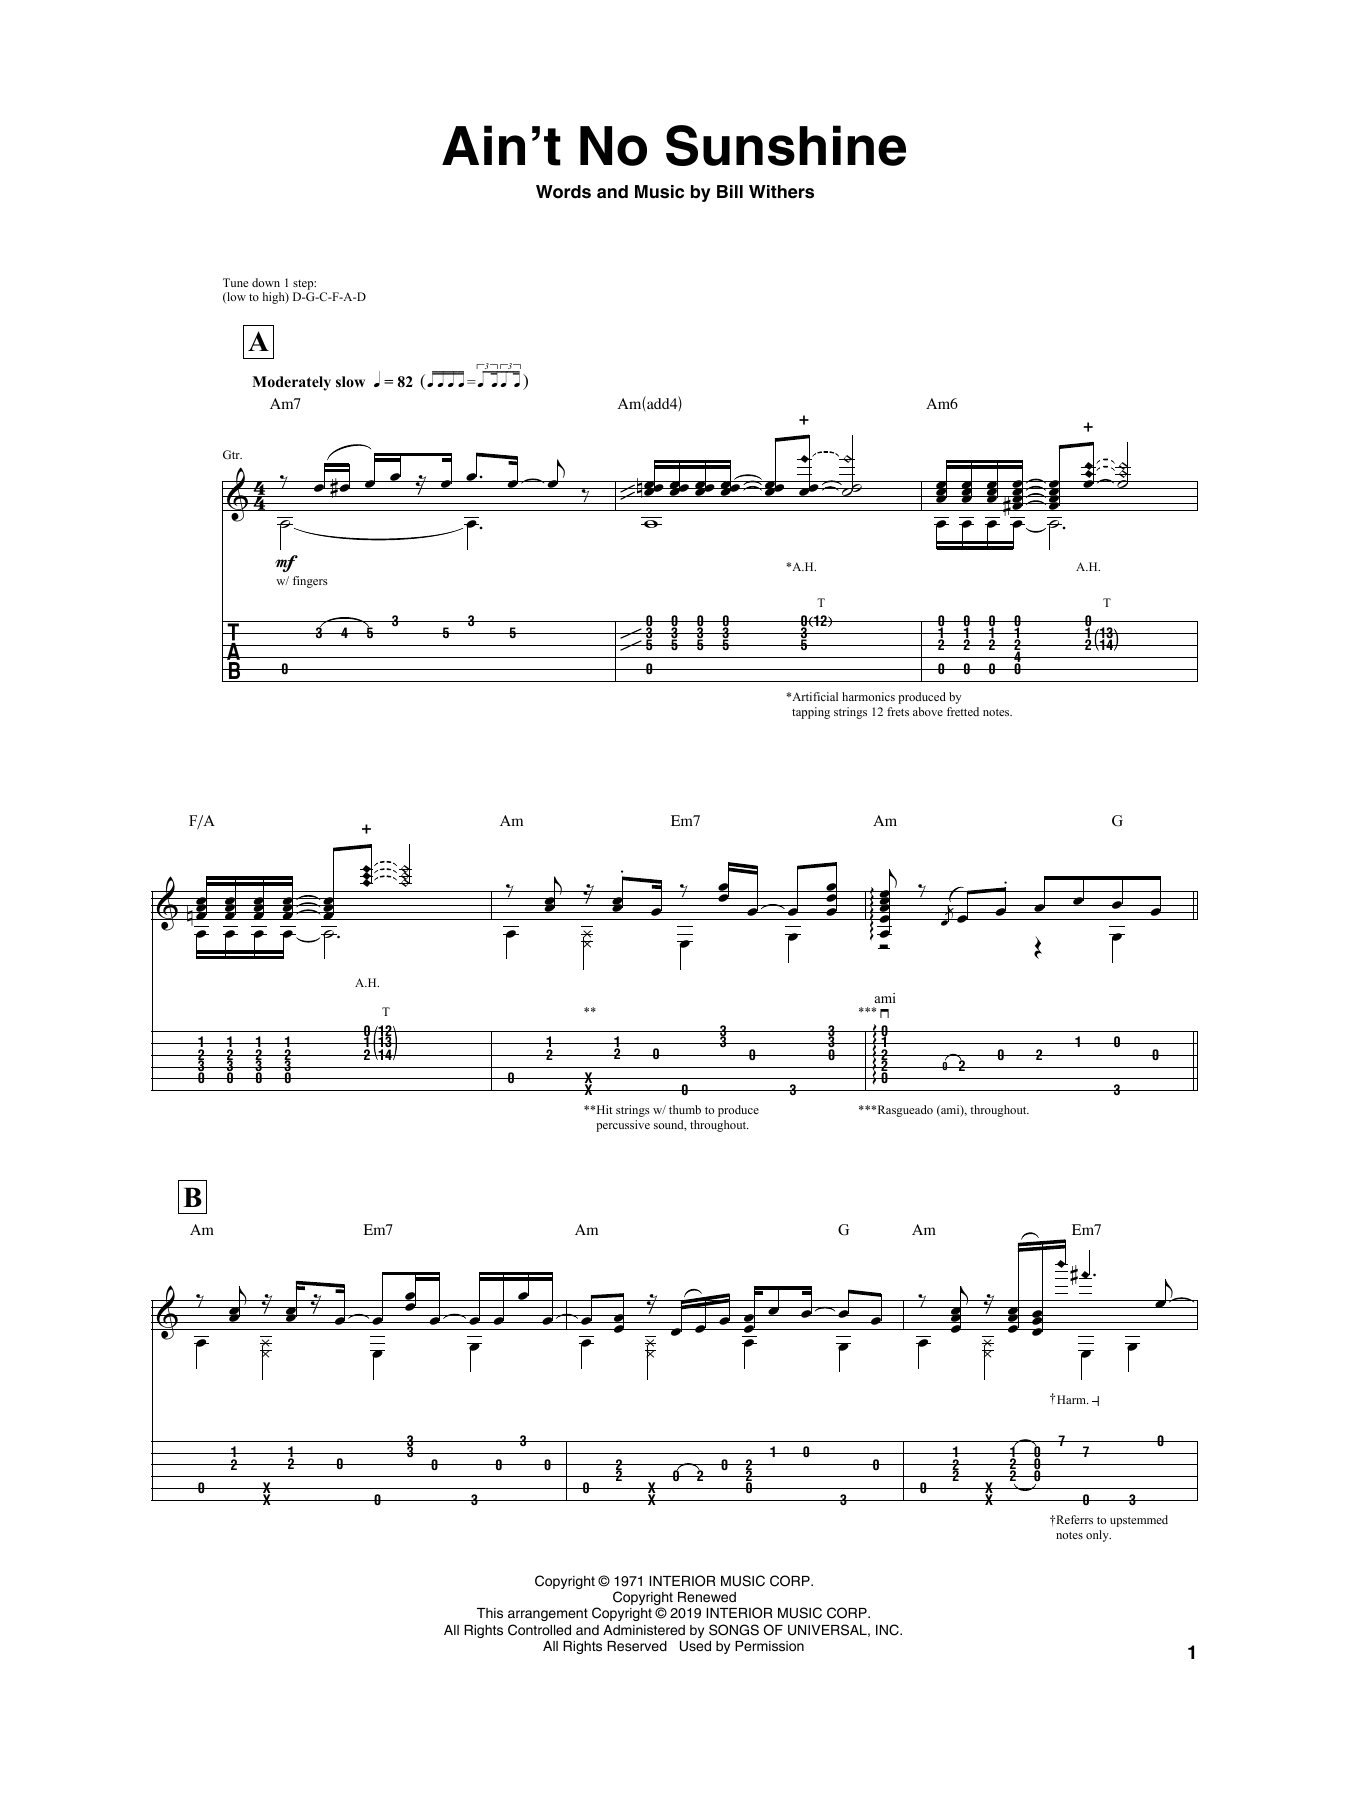 Igor Presnyakov Ain T No Sunshine Sheet Music Pdf Notes Chords Pop Score Guitar Tab Download Printable Sku 407177 Best of eagles guitar chords. igor presnyakov ain t no sunshine sheet music notes chords download printable guitar tab pdf score sku 407177